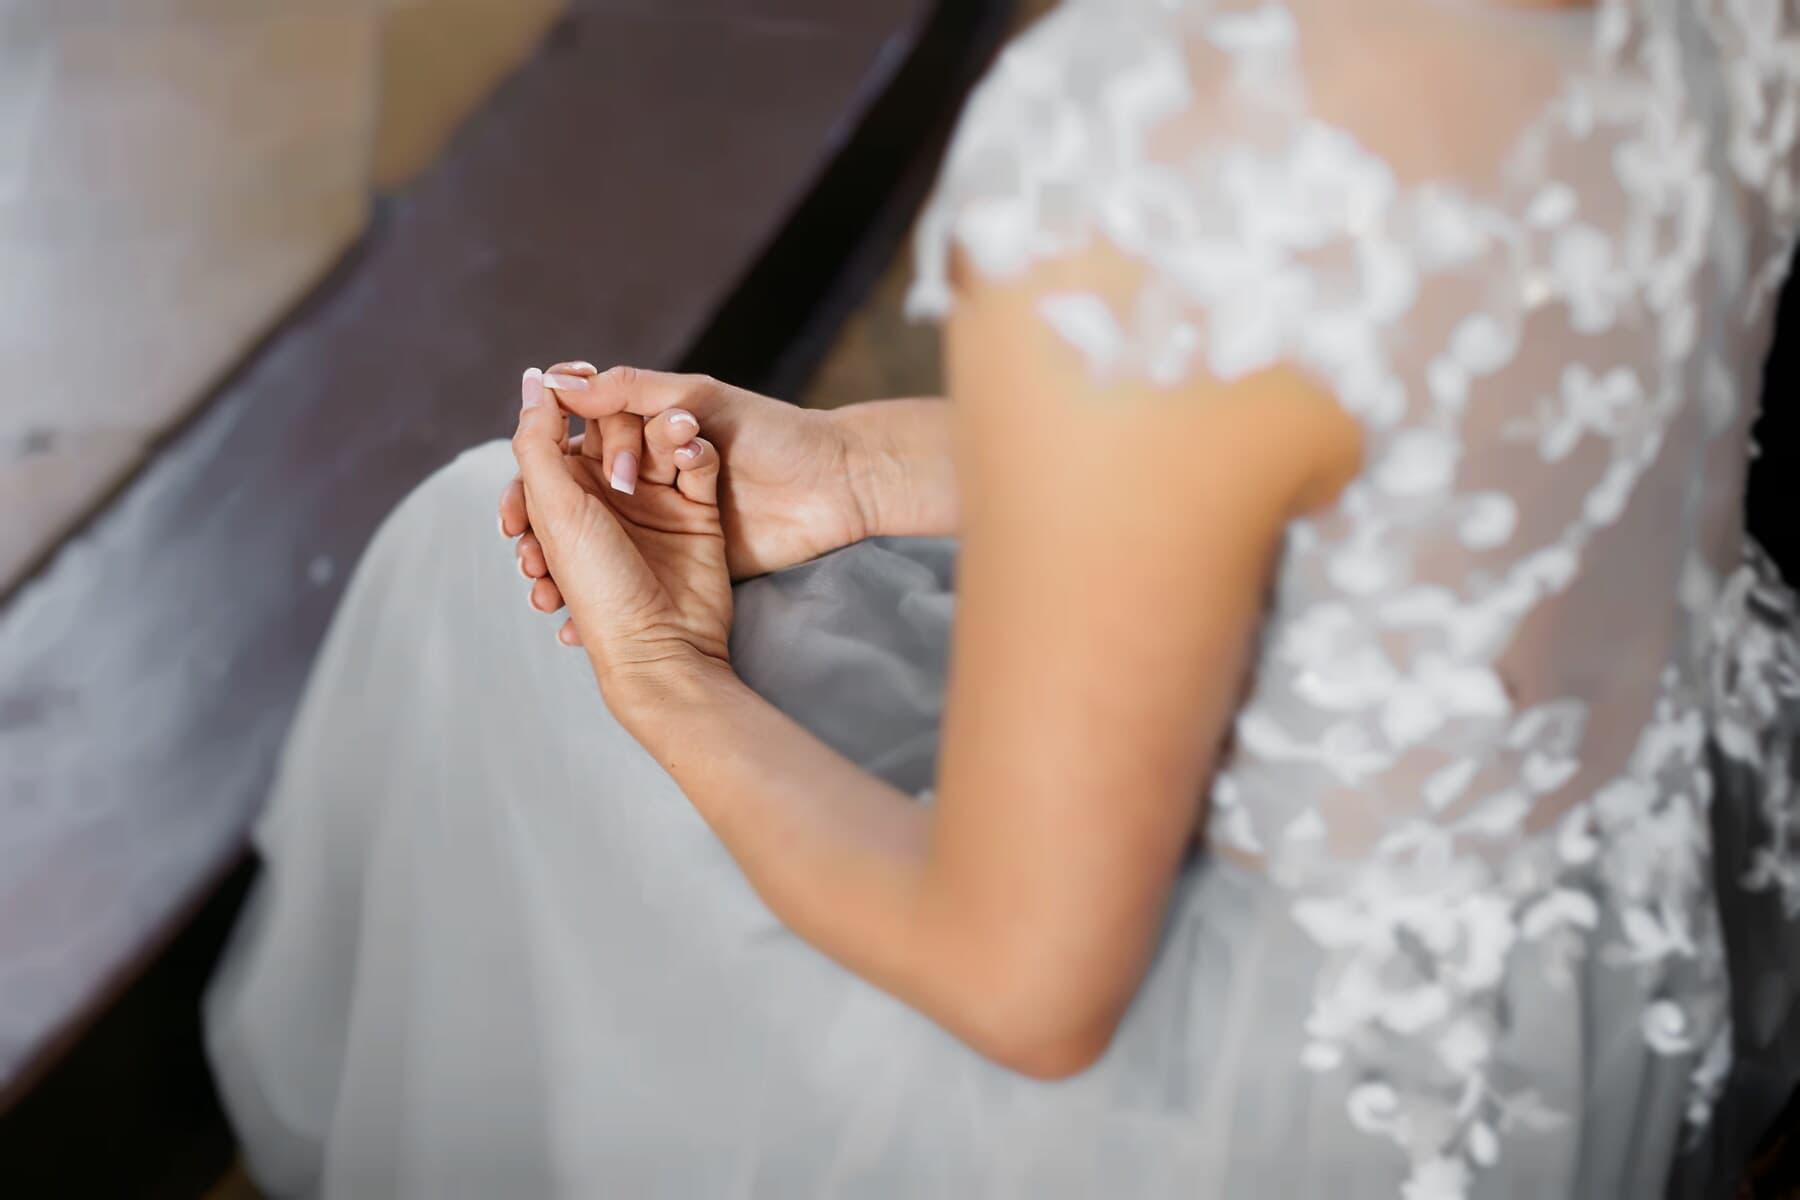 sadness, grief, emotion, bride, alone, wedding, love, hands, depression, woman